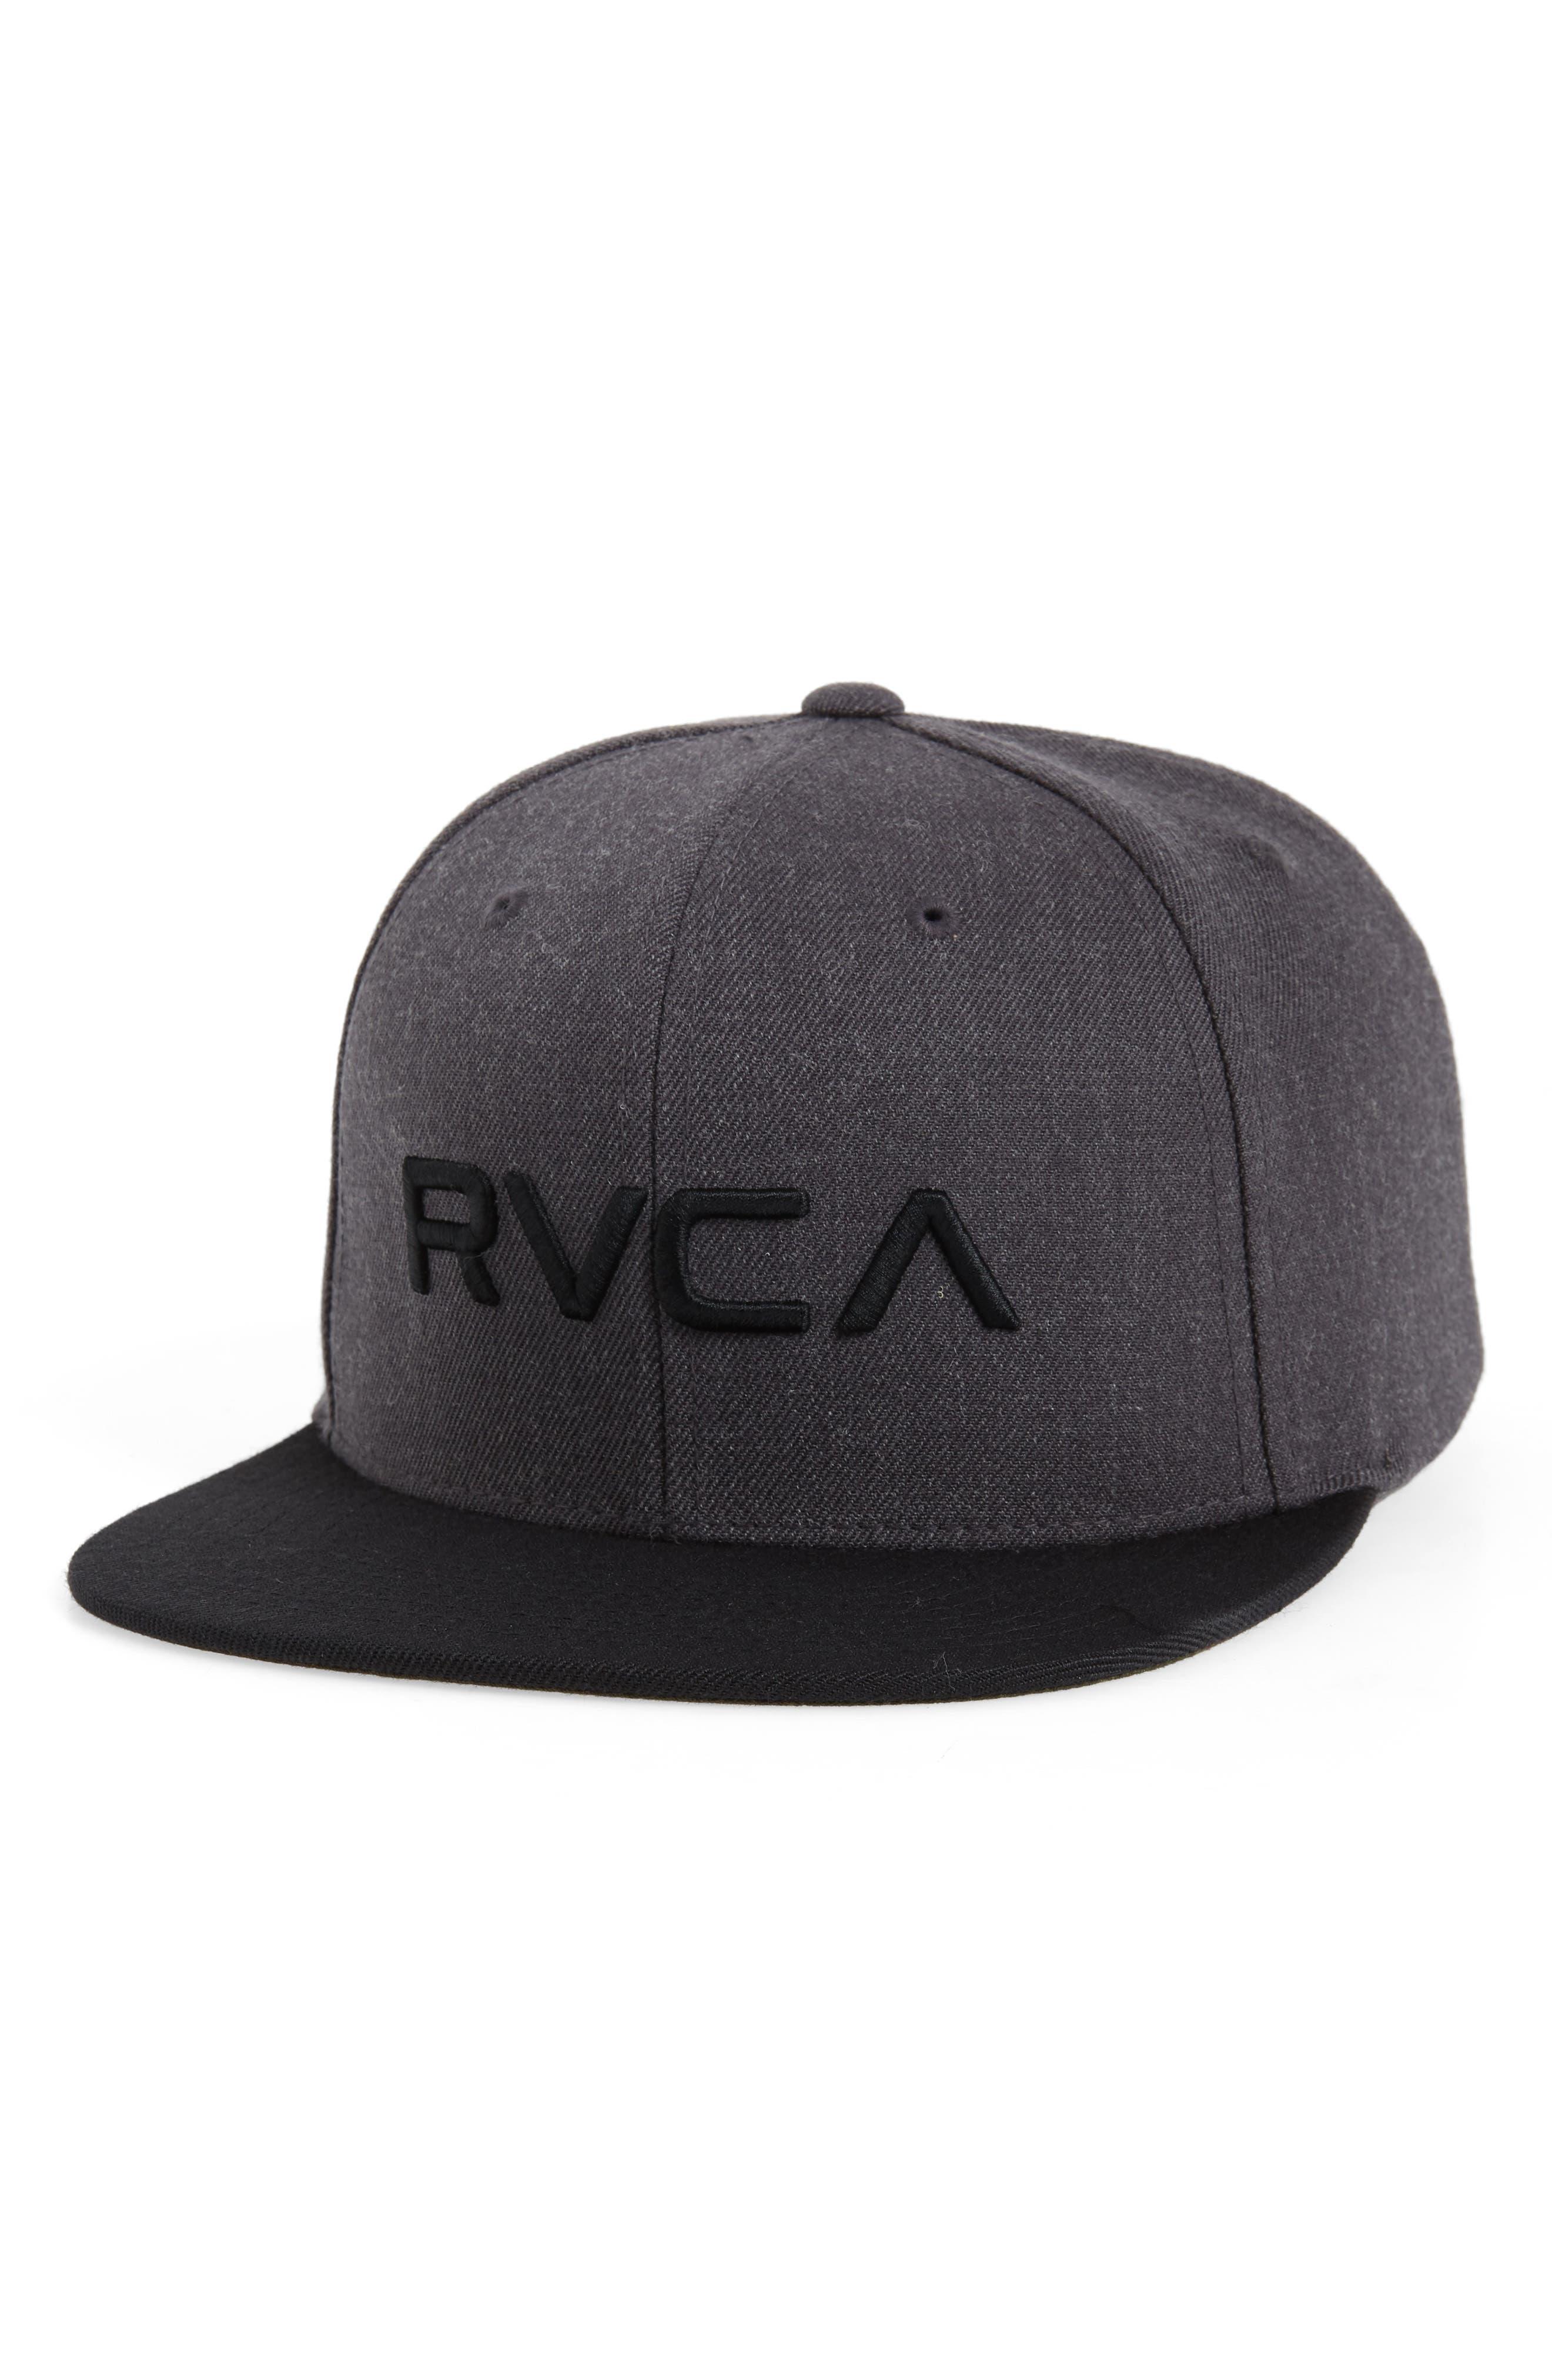 Twill Snapback Baseball Cap,                         Main,                         color, CHARCOAL HEATHER/BLACK